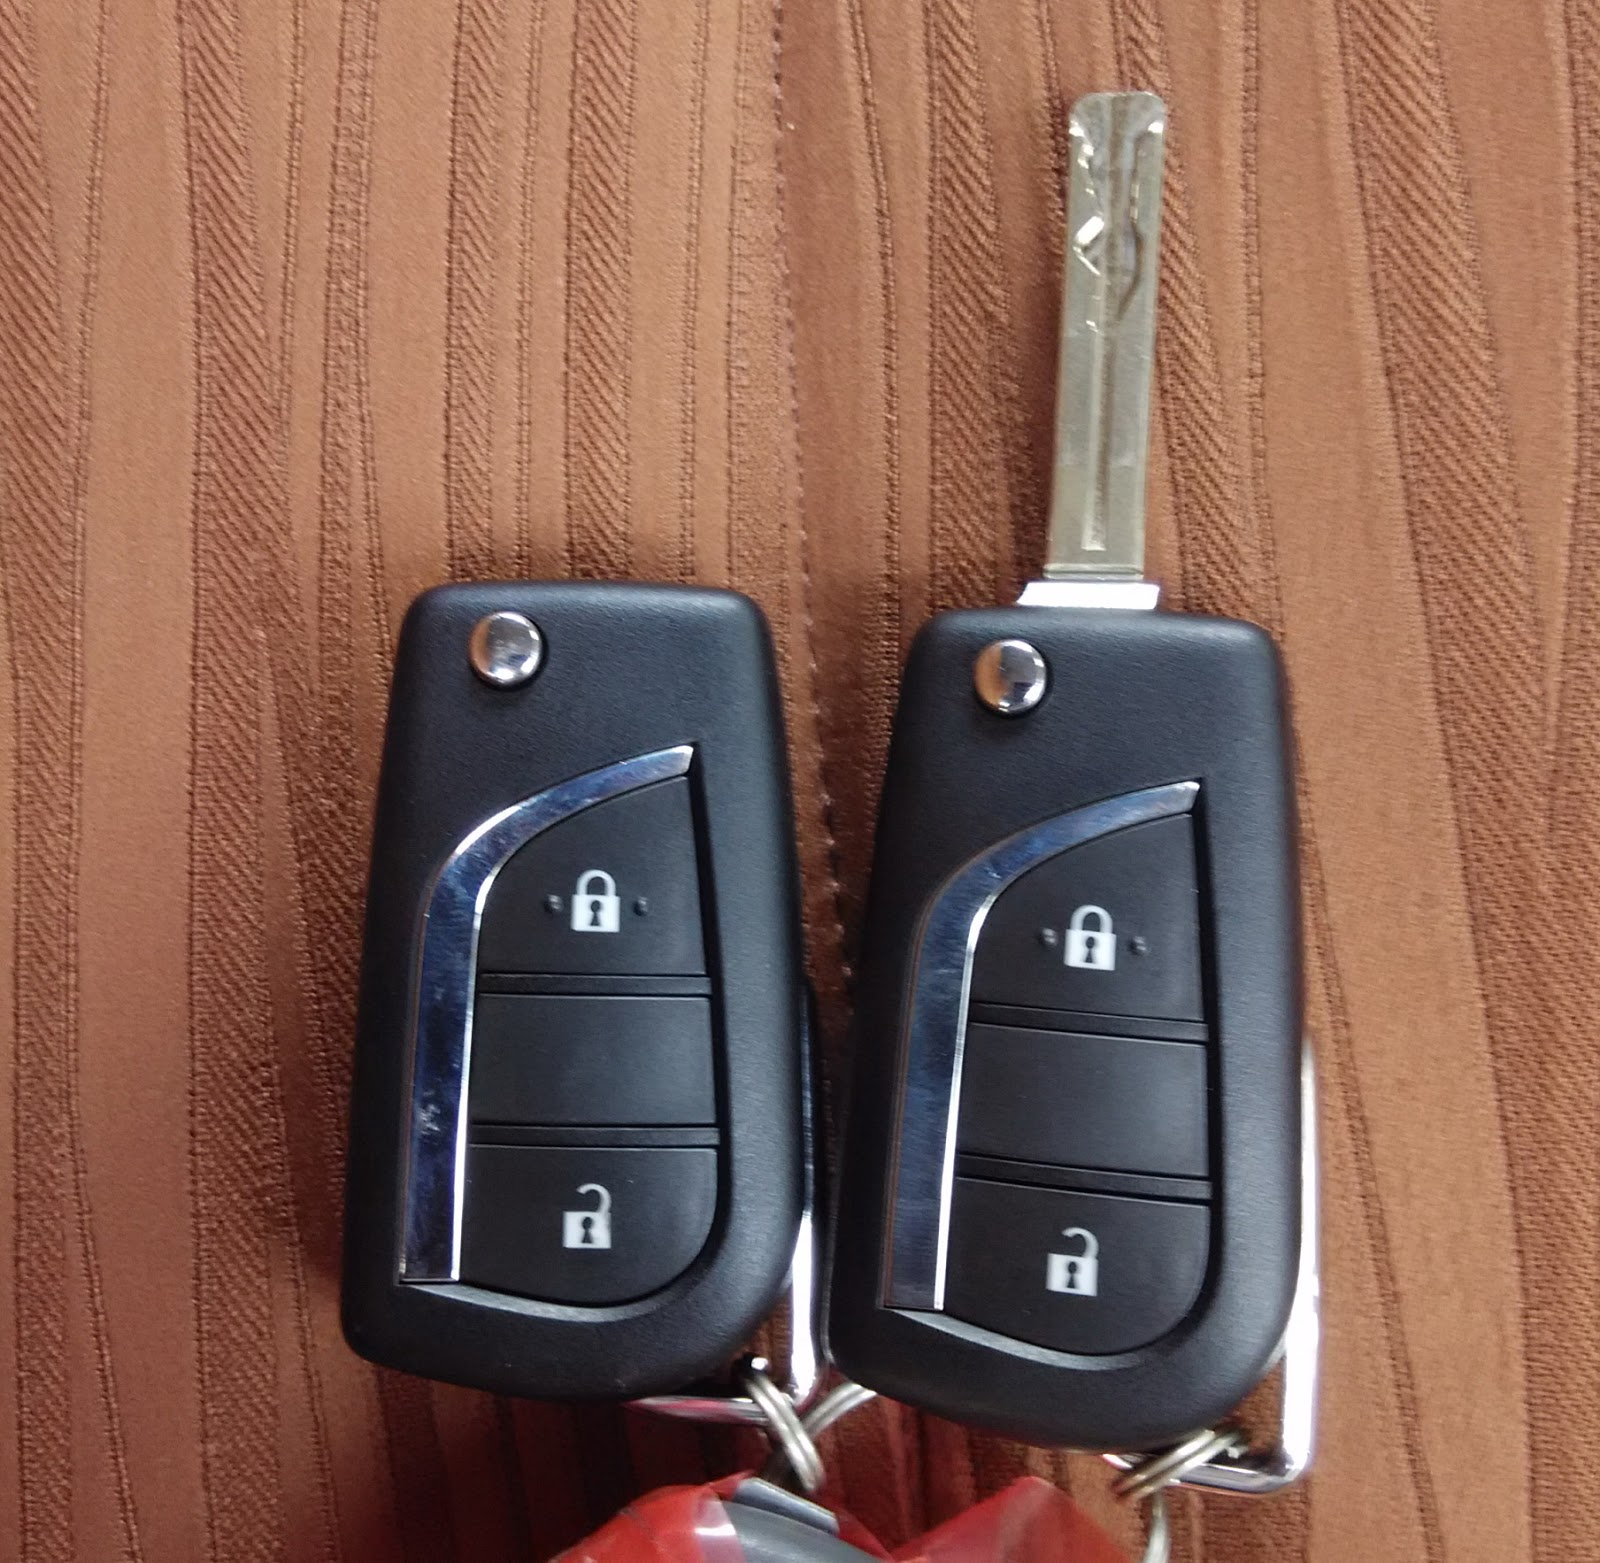 Harga All New Kijang Innova 2016 Type G Grand Avanza Warna Grey Metallic Melihat Interior Tipe V Dikta Toyota Informasi